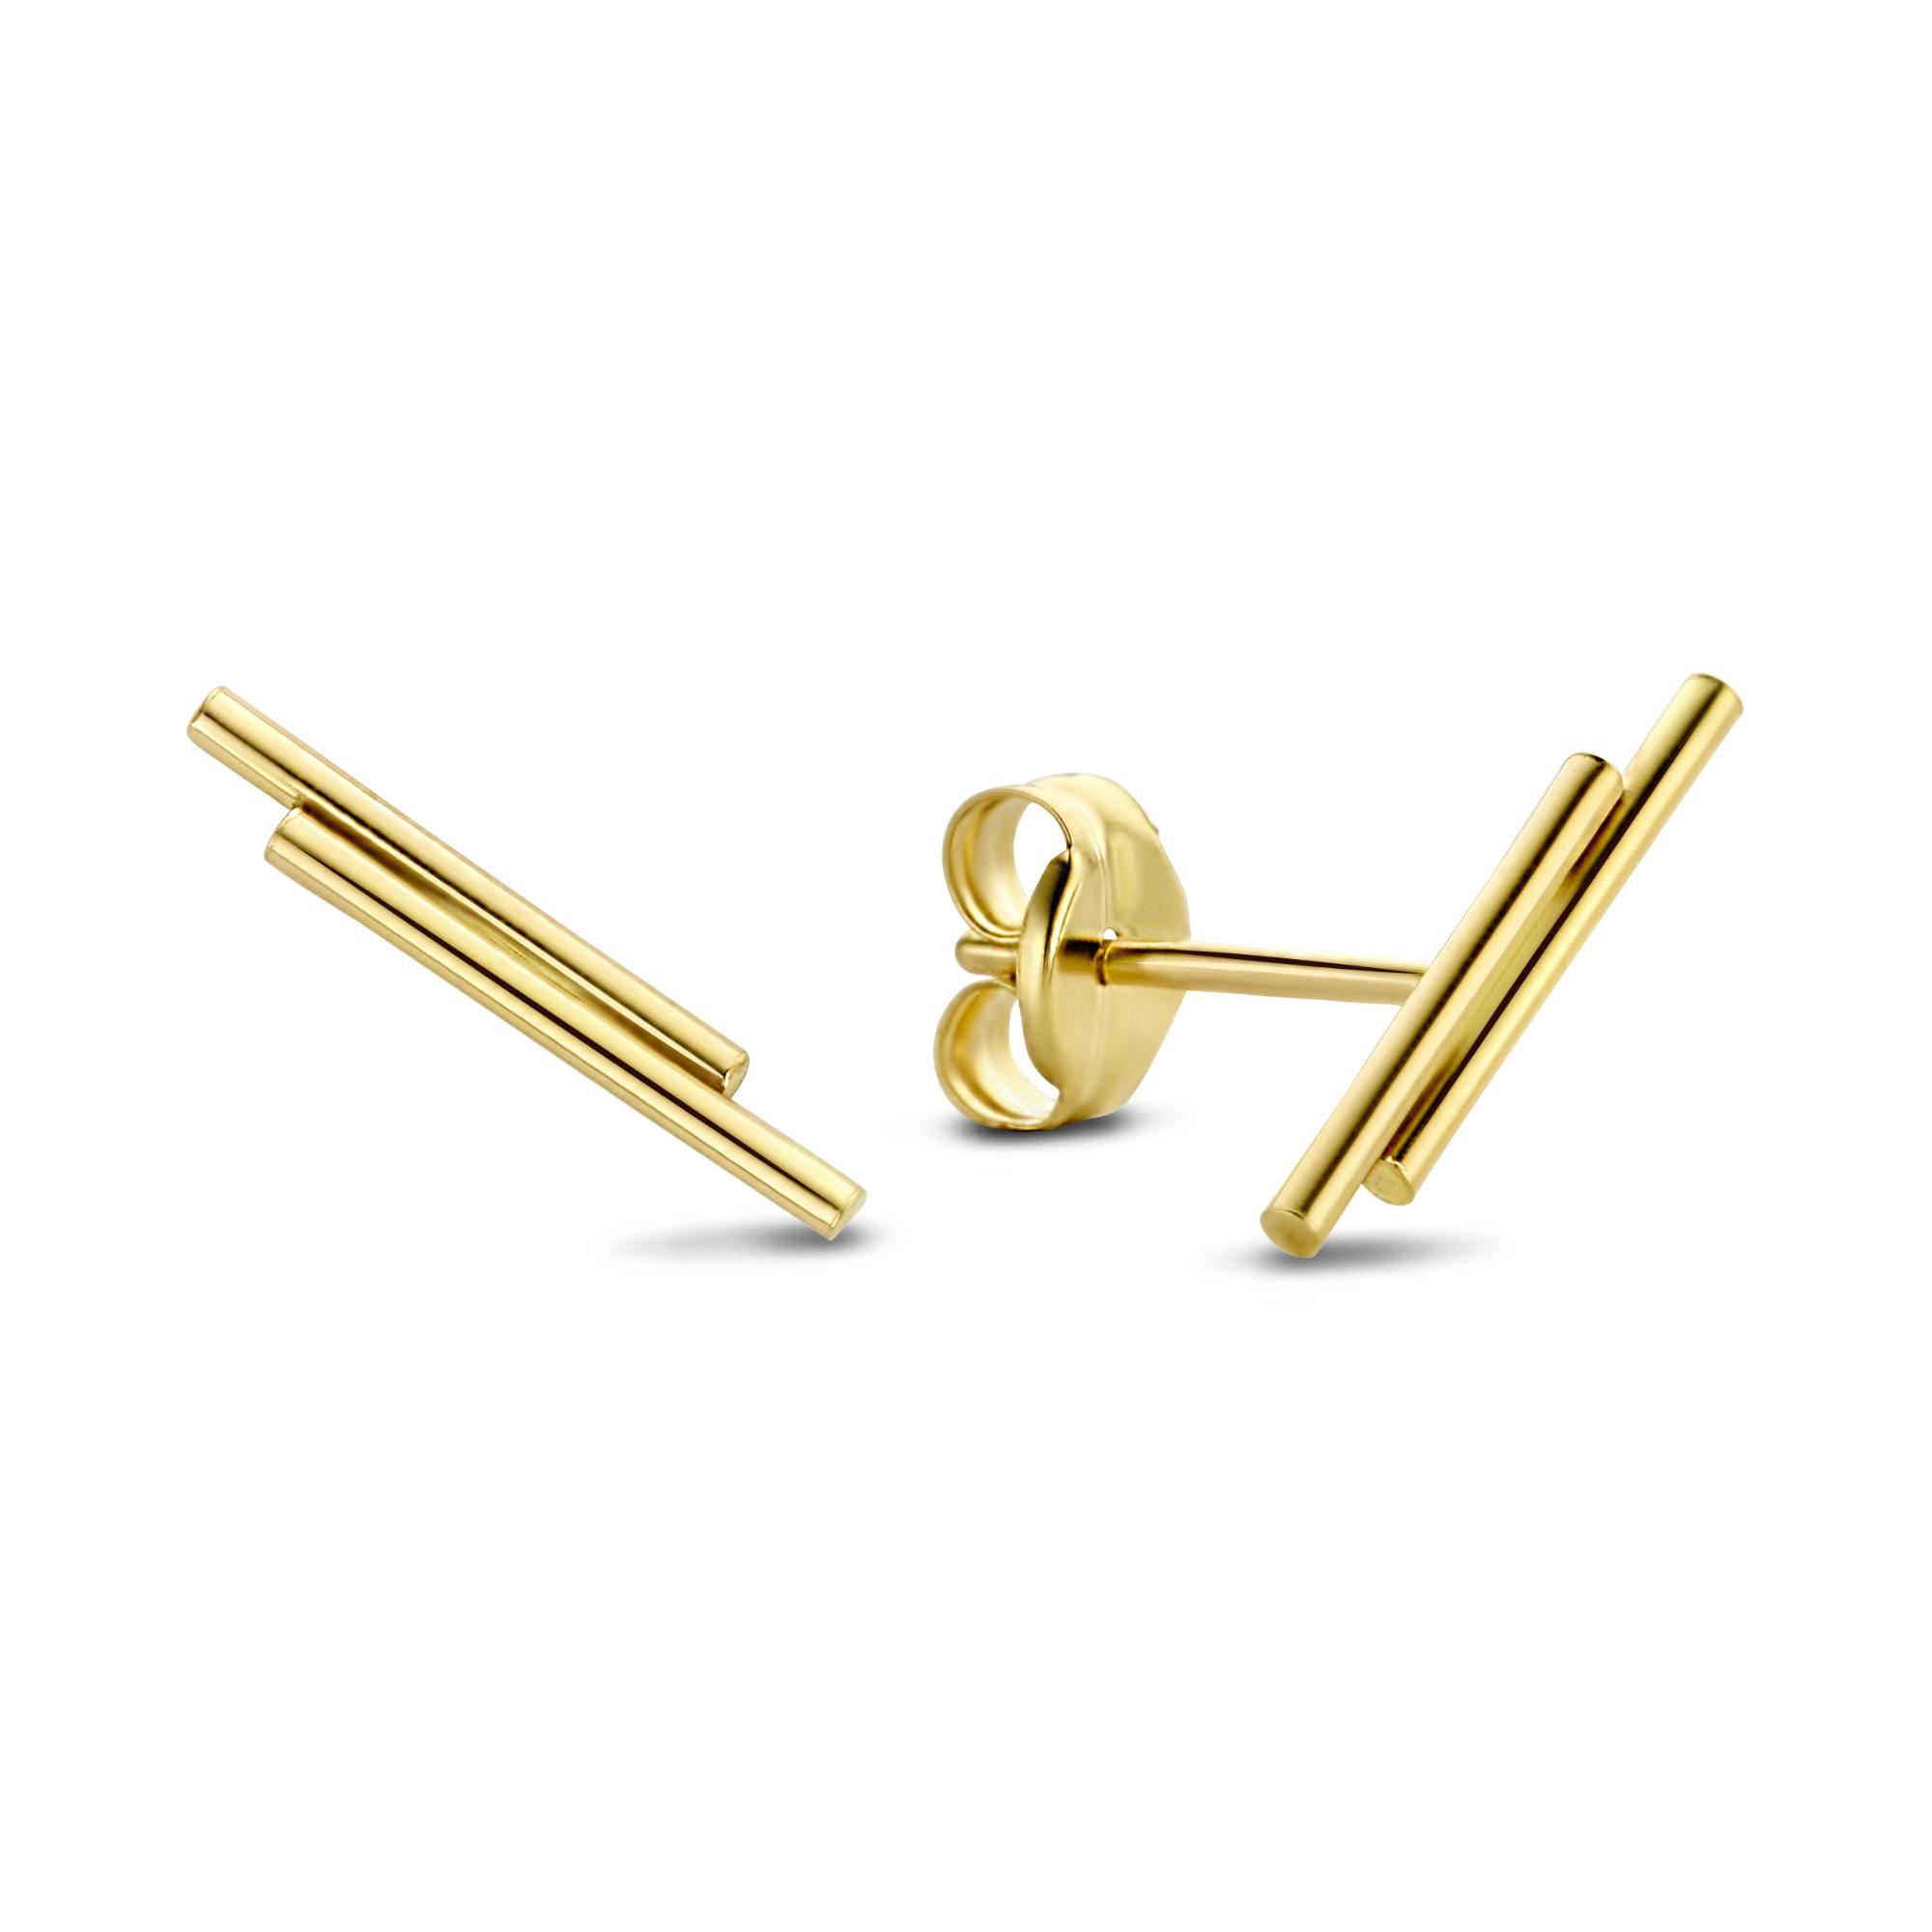 Isabel Bernard Le Marais Barbès 14 karat gold ear studs with rods